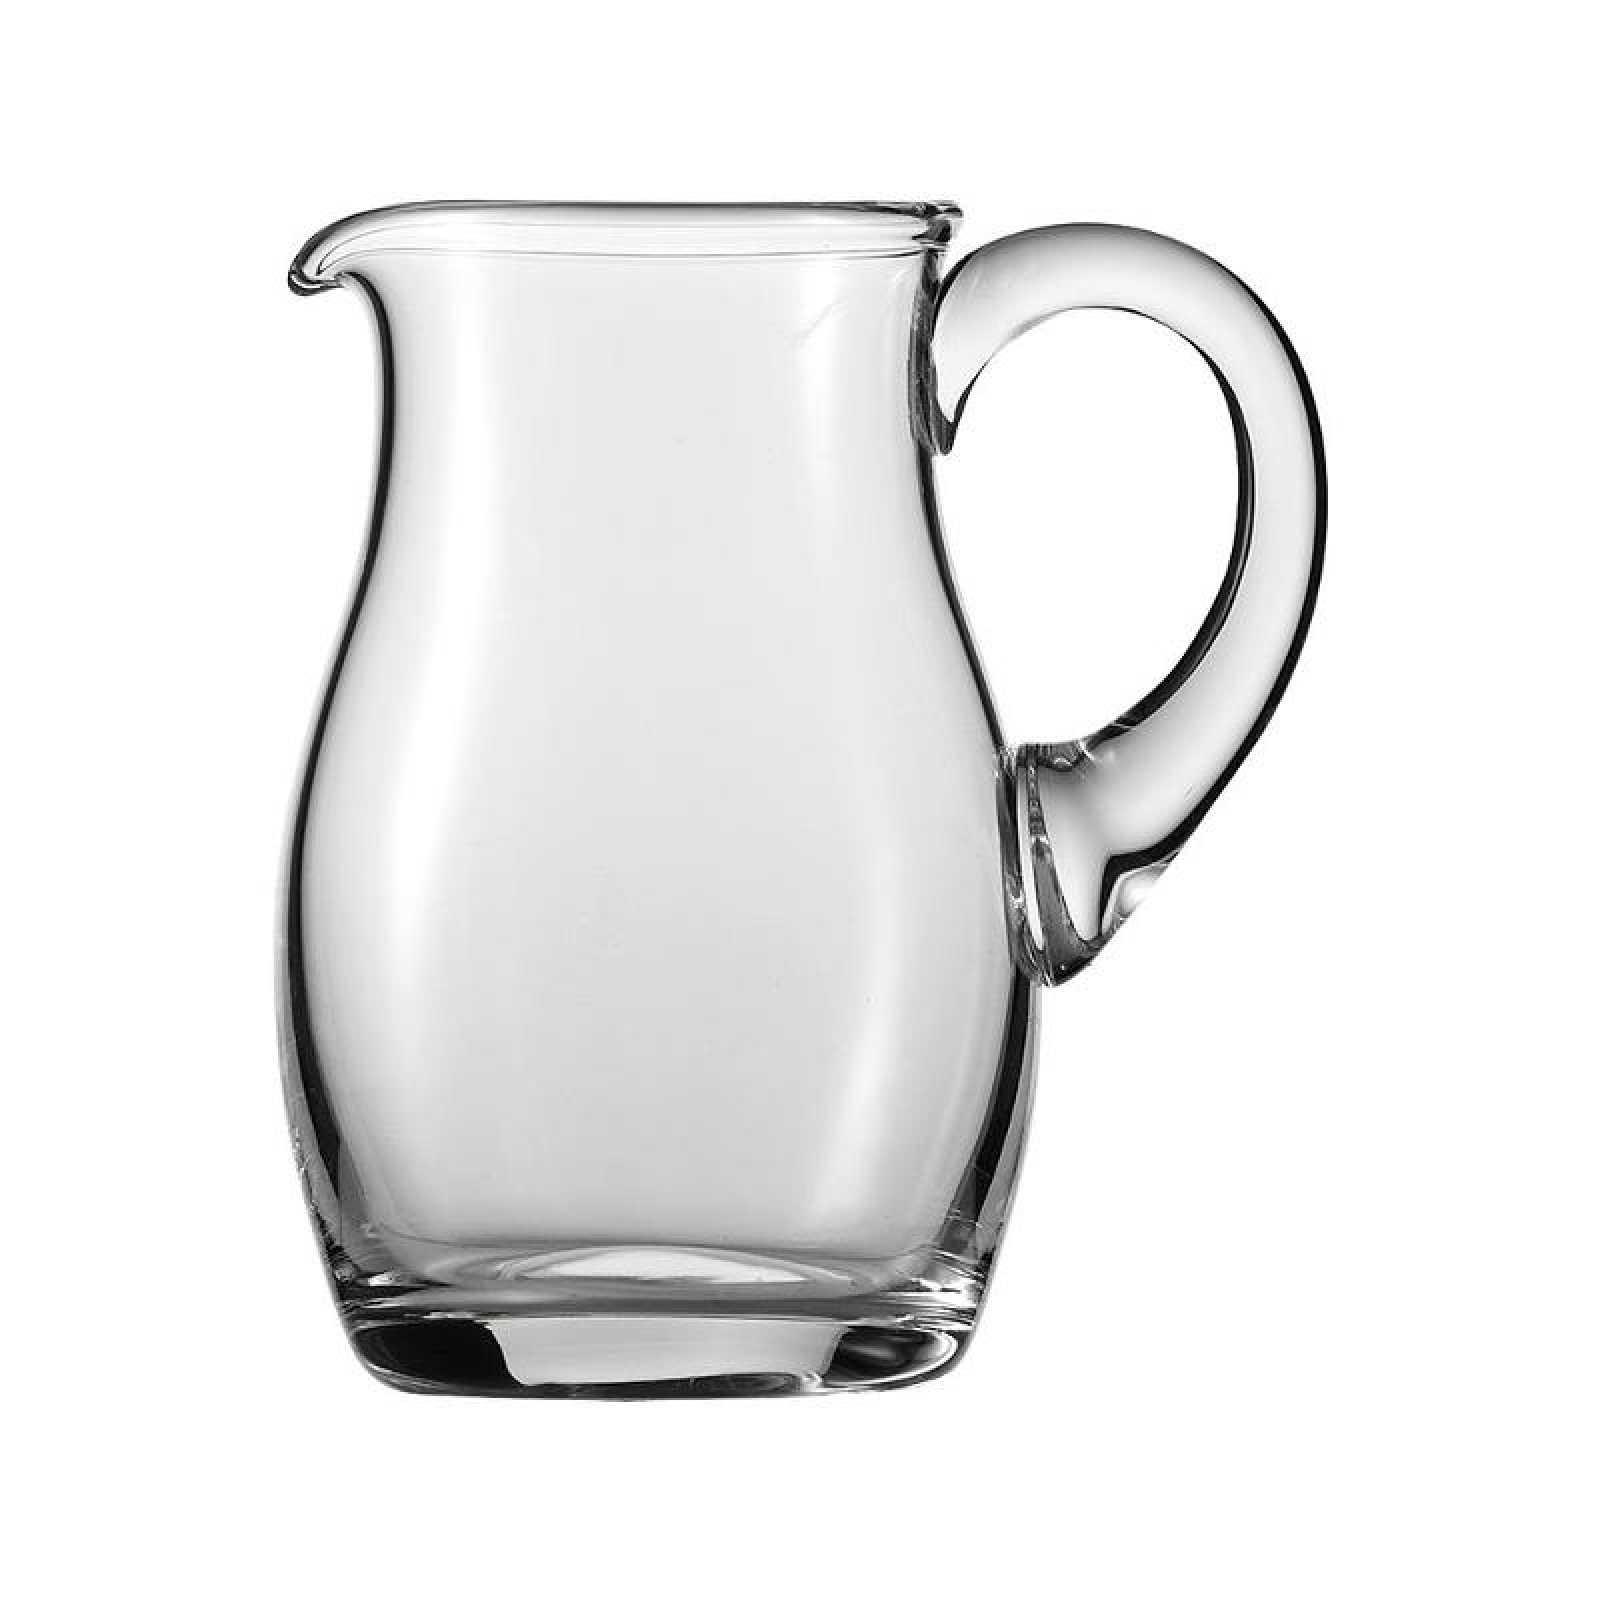 Онлайн каталог PROMENU: Кувшин хрустальный Schott Zwiesel BISTRO, объем 0,25 л, прозрачный Schott Zwiesel 400045